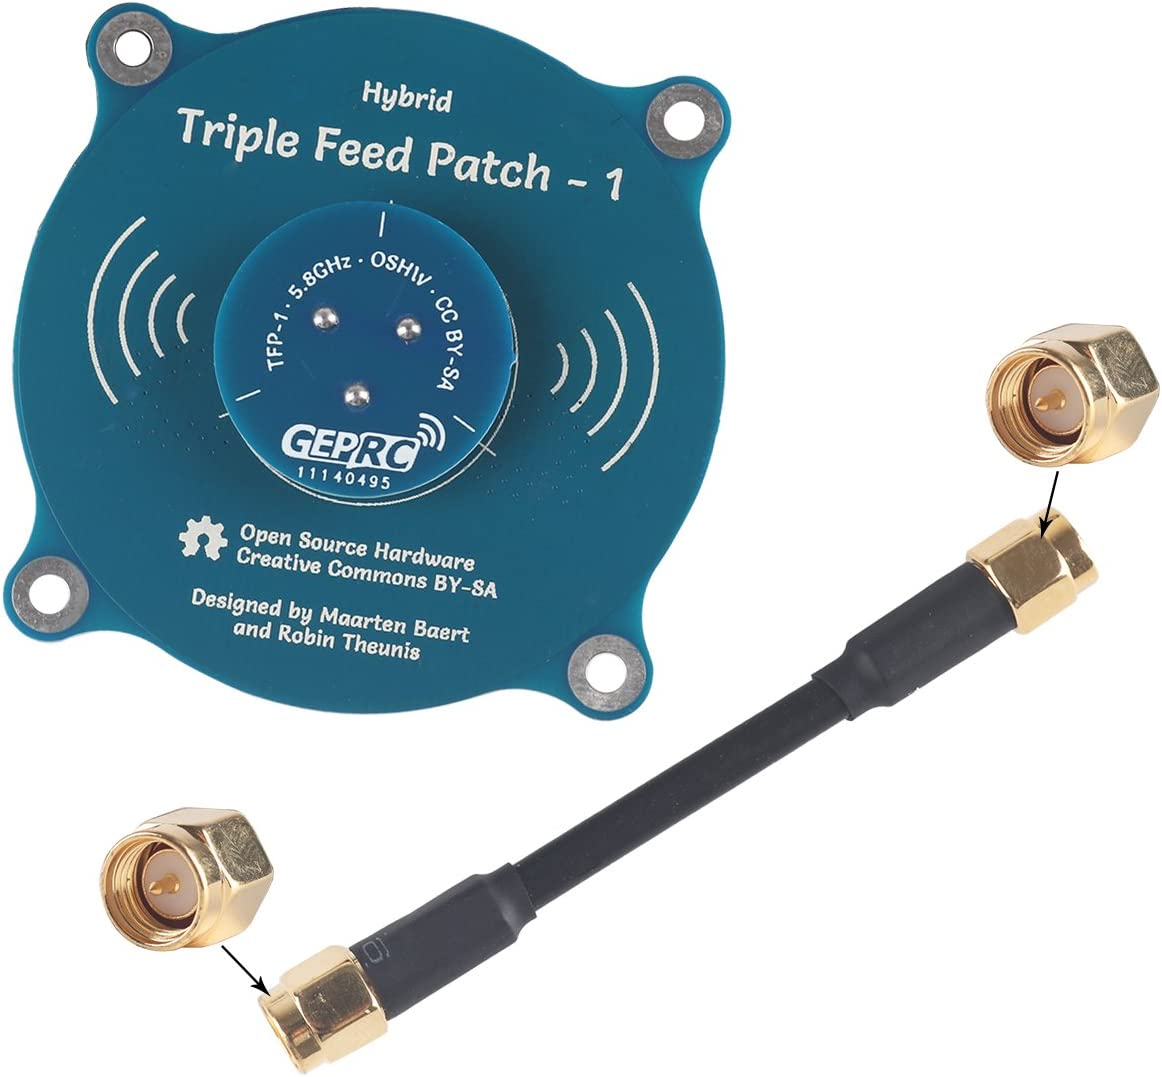 Crazepony-UK LANTIAN 5.8G FPV Antena Panel Pagoda Pro 9.4 dBi Alto Ganancia TX RX RP-SMA Hembra y SMA Macho para FPV Racing Drone